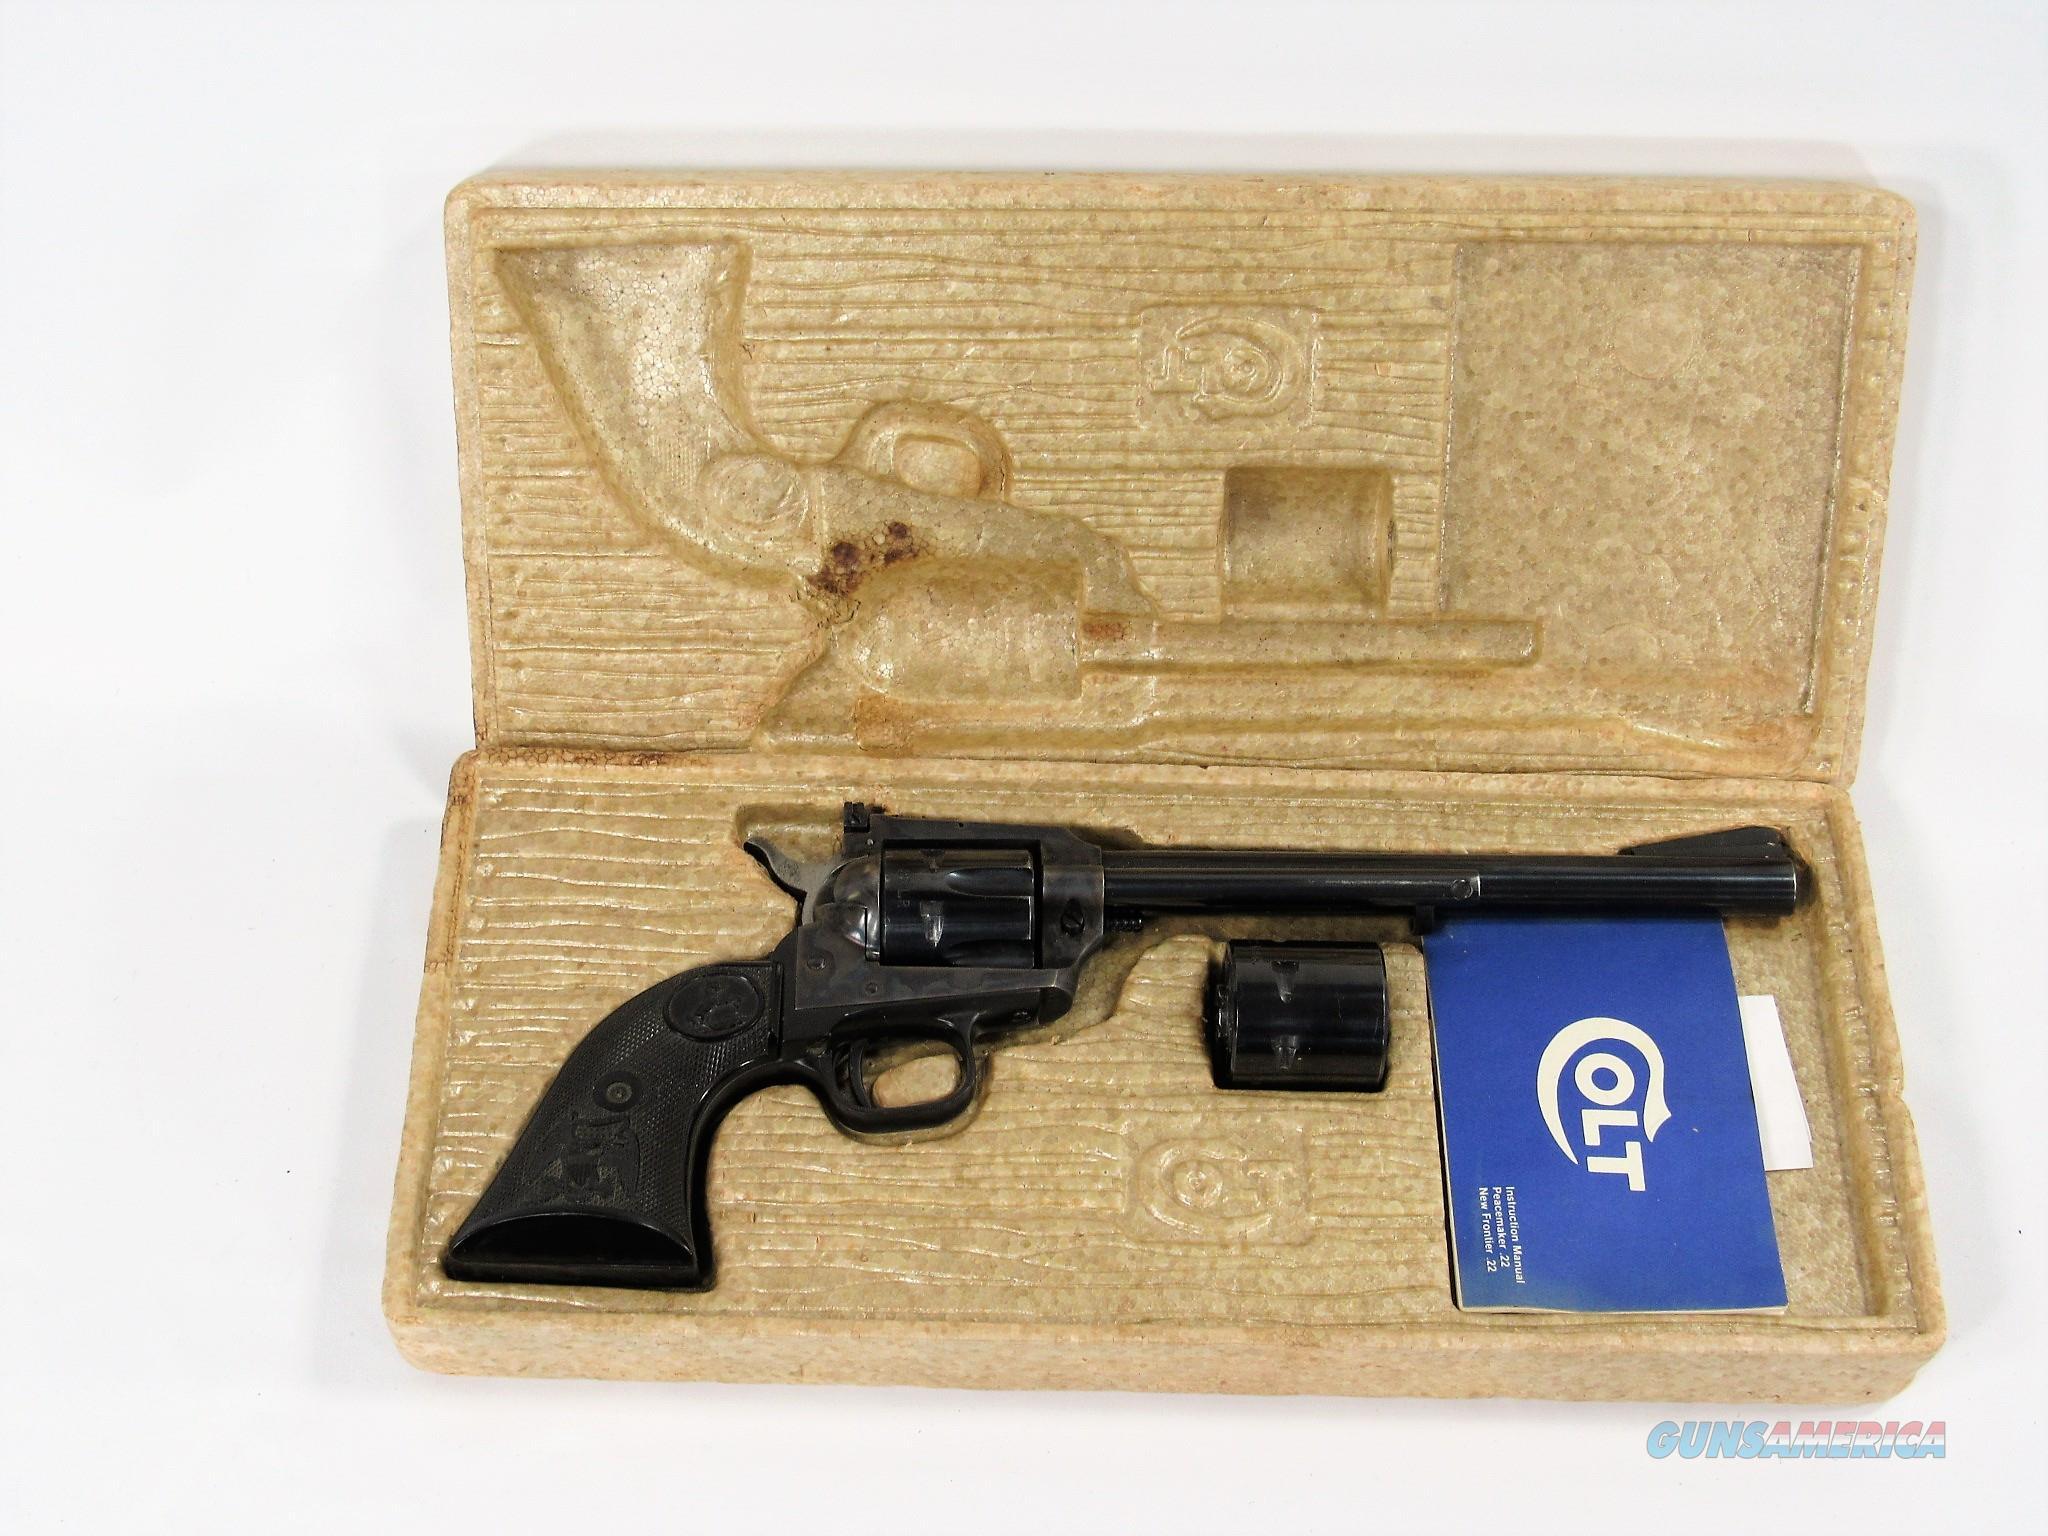 29Y COLT NEW FRONTIER BUNTLINE 22/22MG  Guns > Pistols > Colt Single Action Revolvers - Modern (22 Cal.)